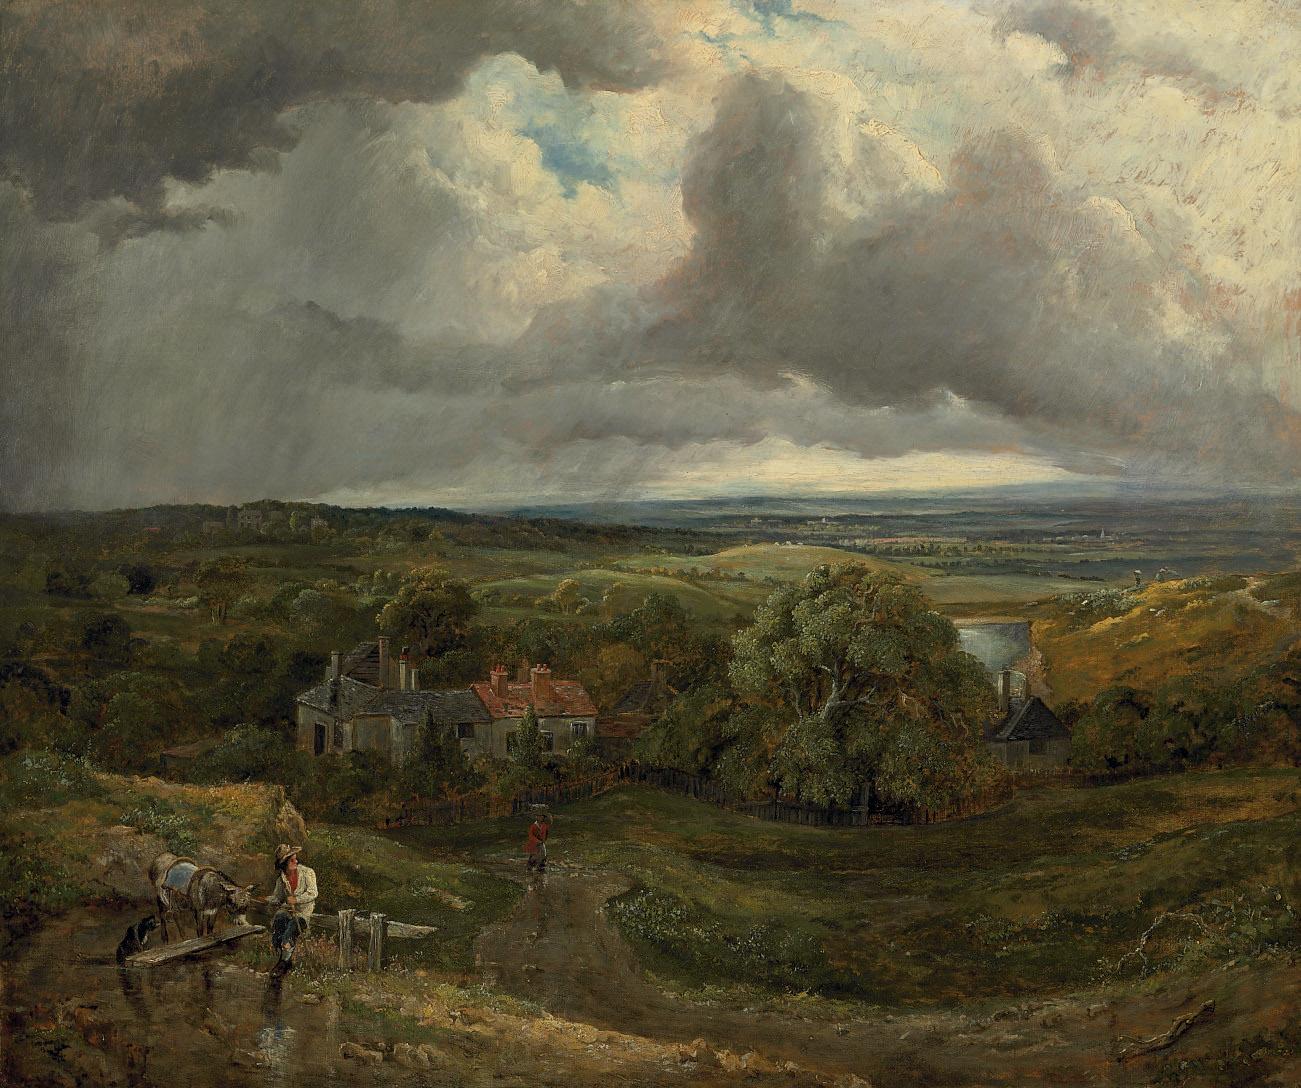 Figures in an extensive landscape